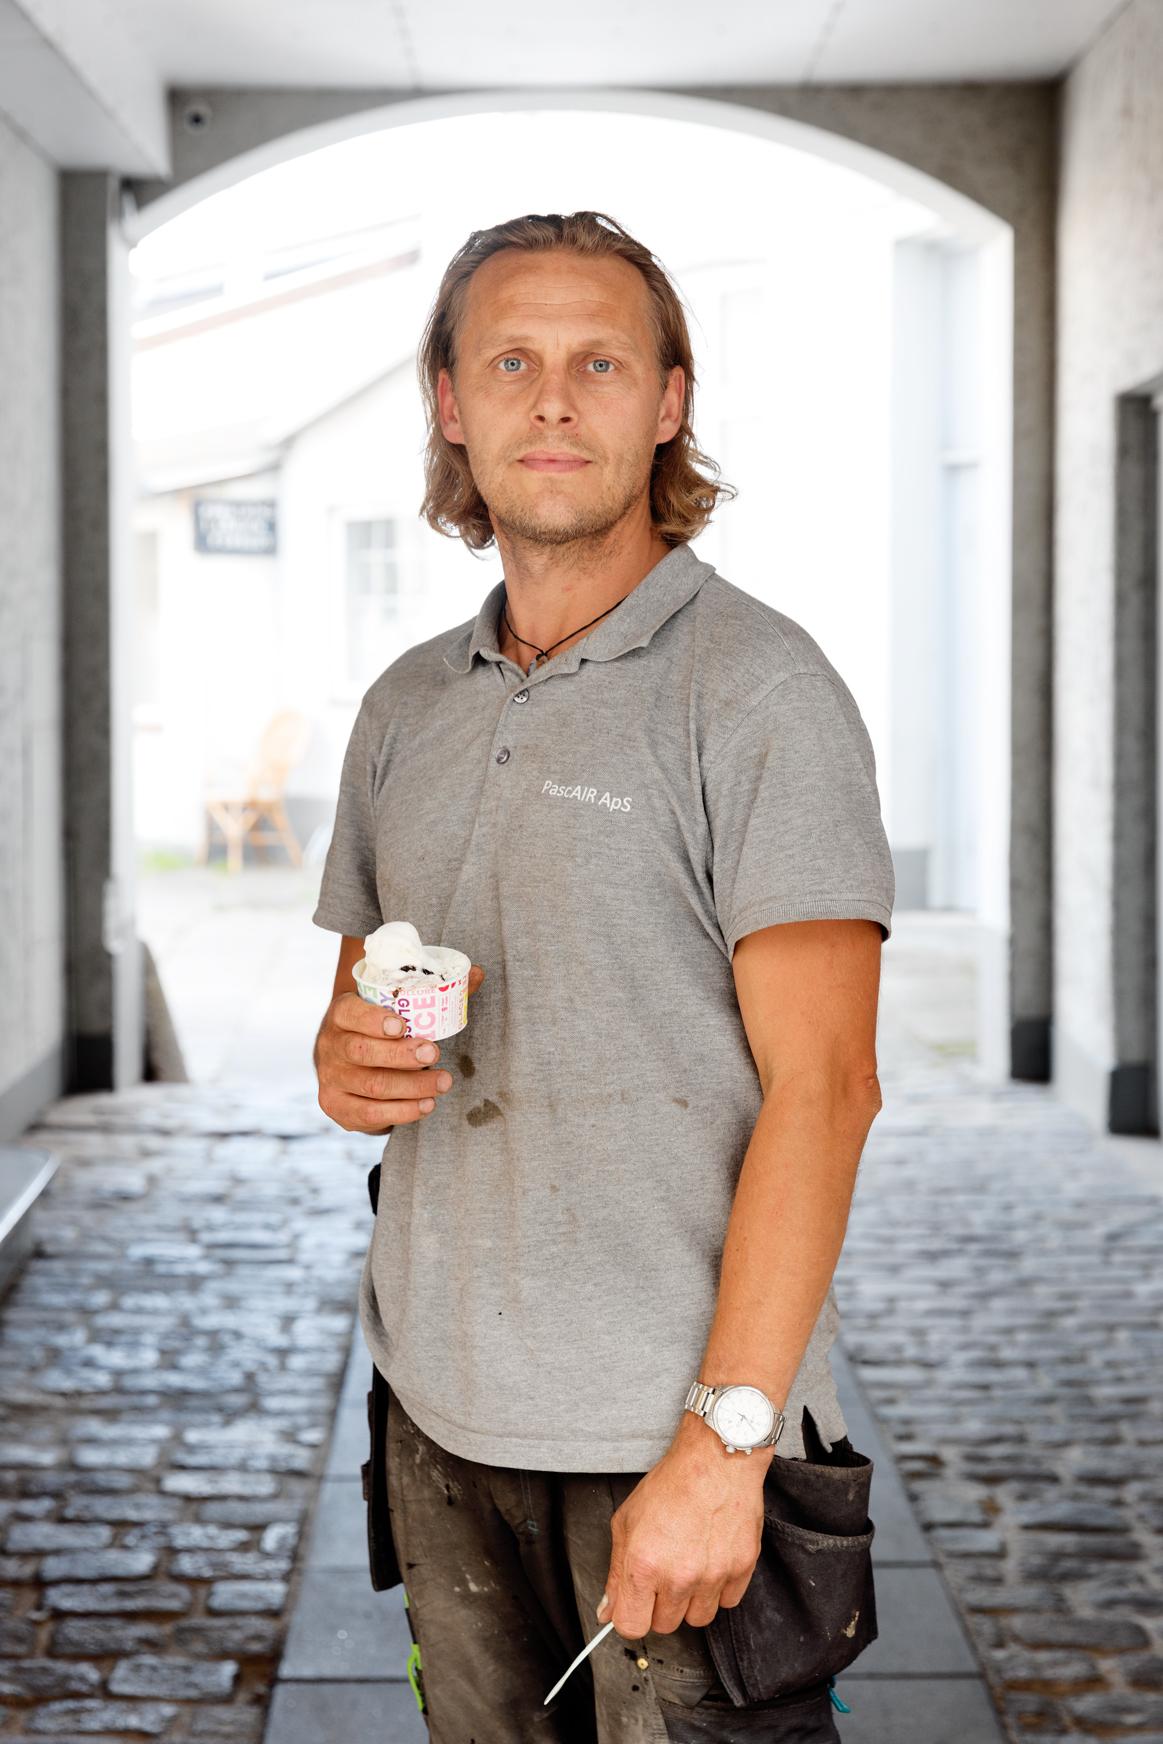 "<span class=""rodt"">Mere ungt, mindre støvet:</span> Nyt Randers-lokalmedie vil gå den ekstra mil 8"